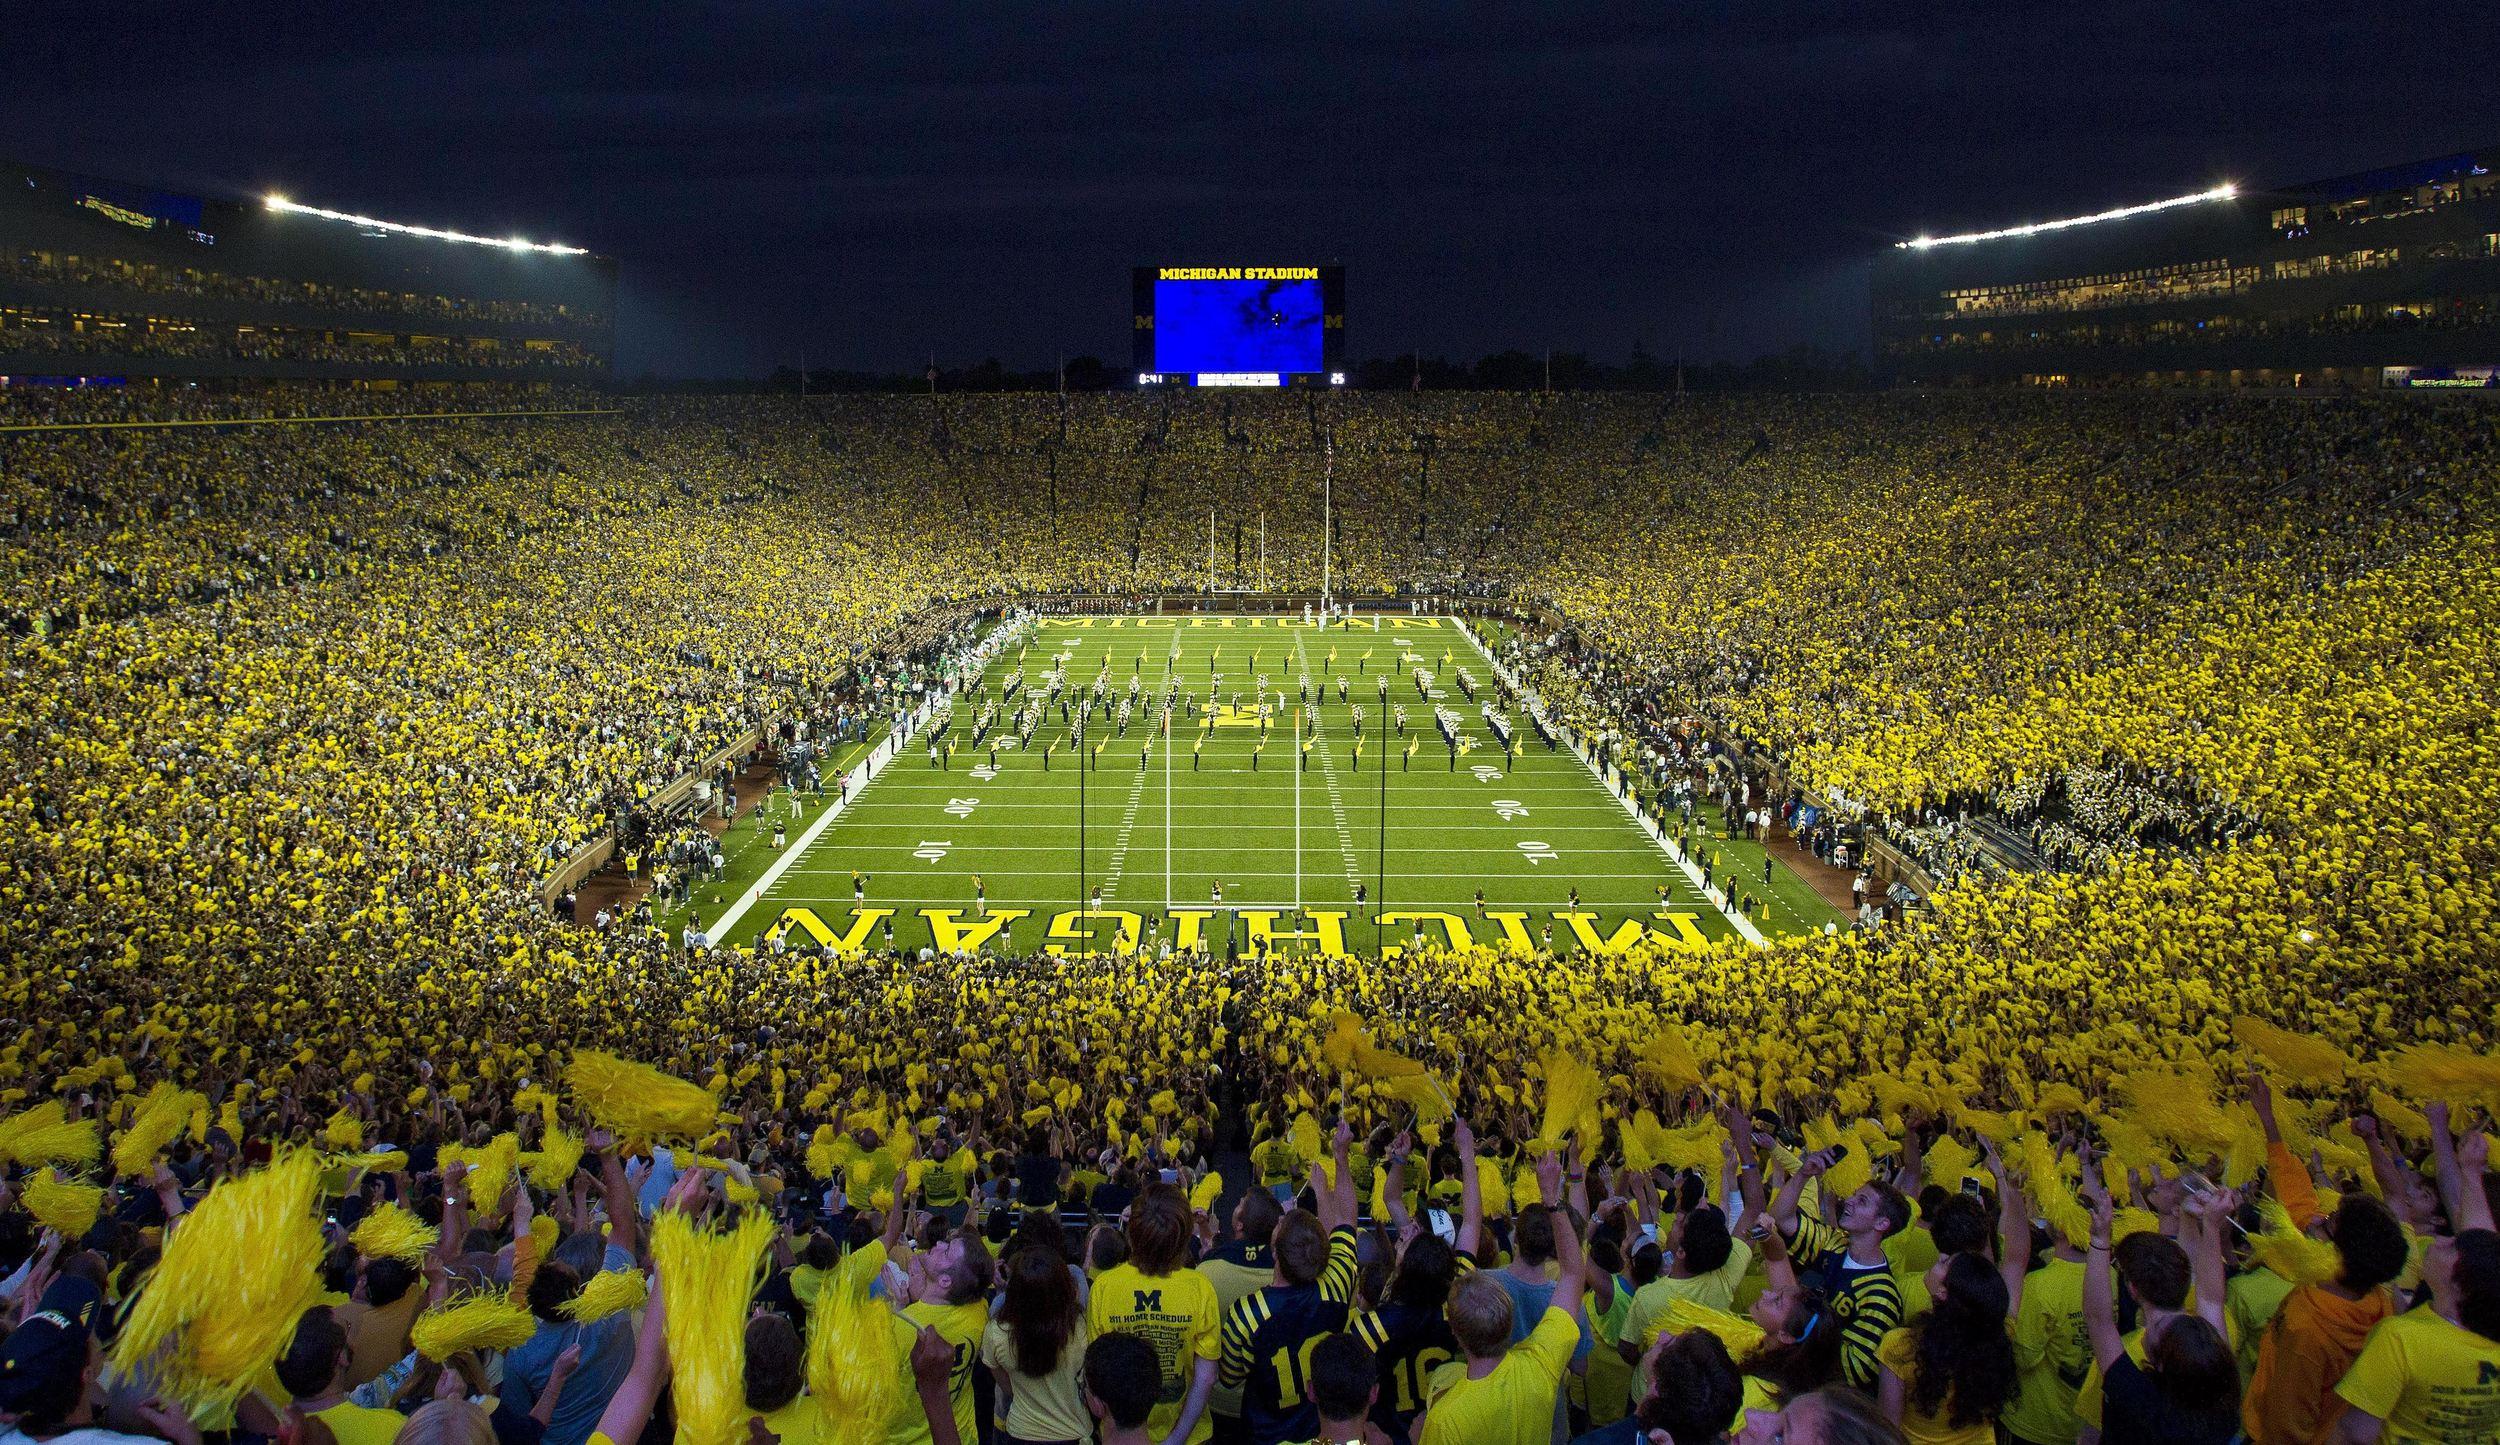 University of Michigan Football Game